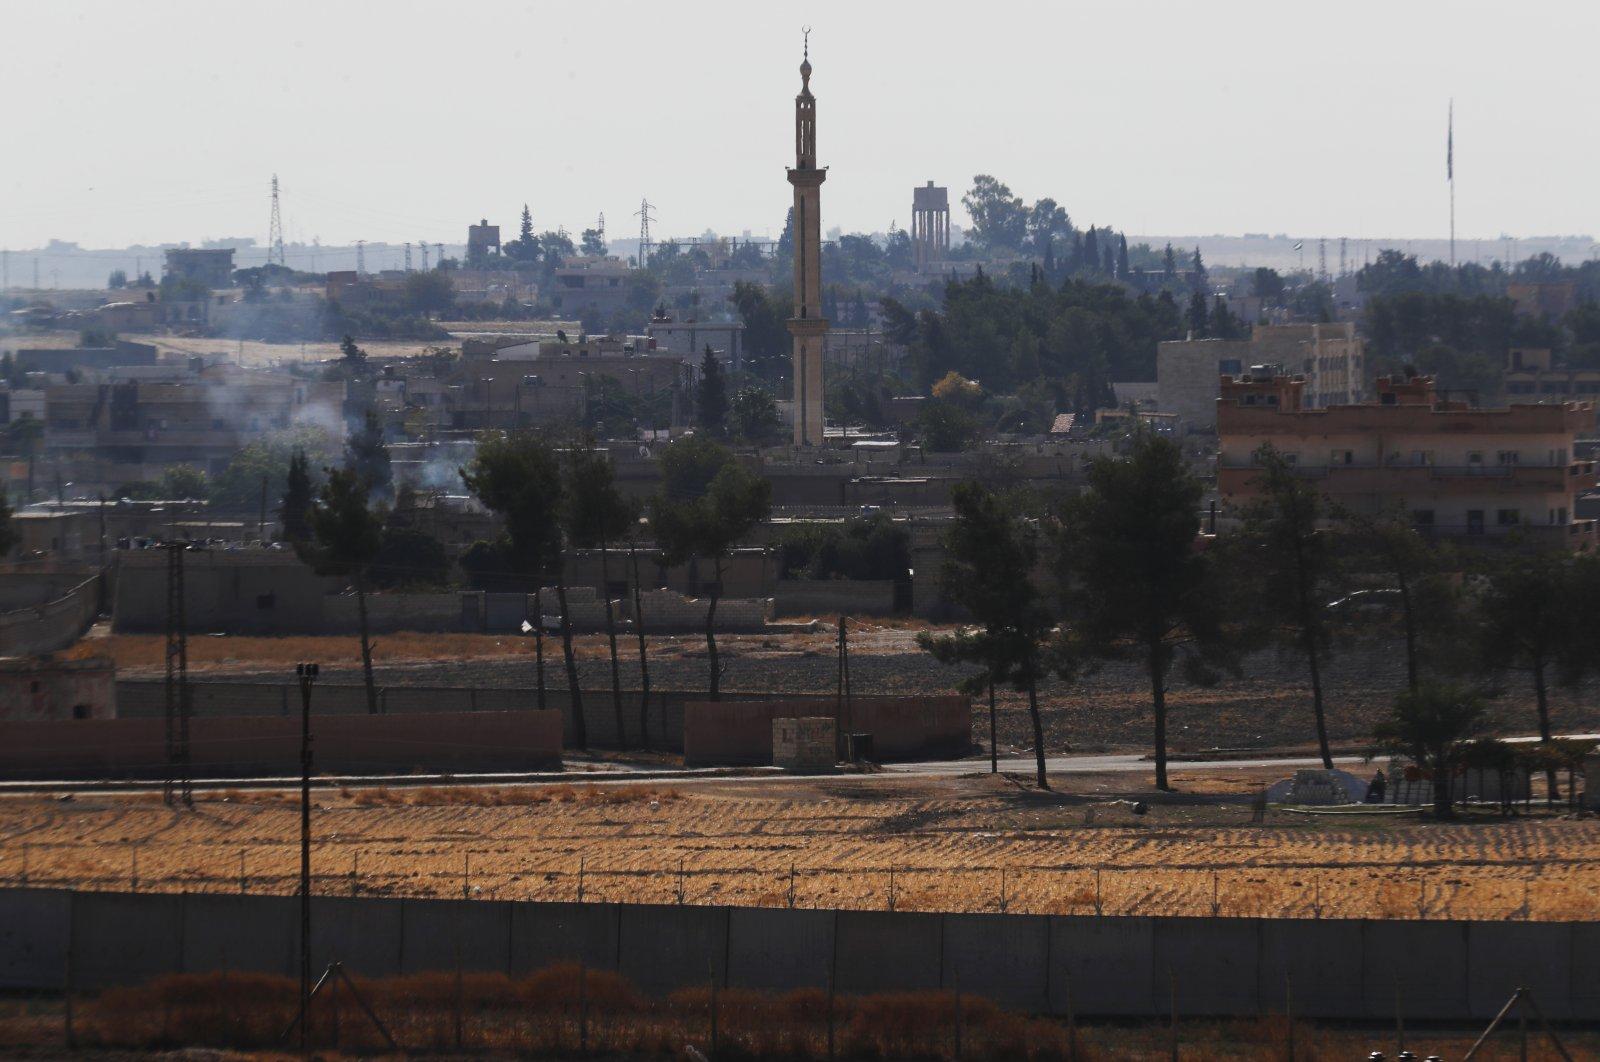 The Syriantown of Tal Abyadis seen from theborder between Turkey and Syria, in Akçakale, Şanlıurfa province, southeastern Turkey, Oct. 23, 2019. (AP Photo)